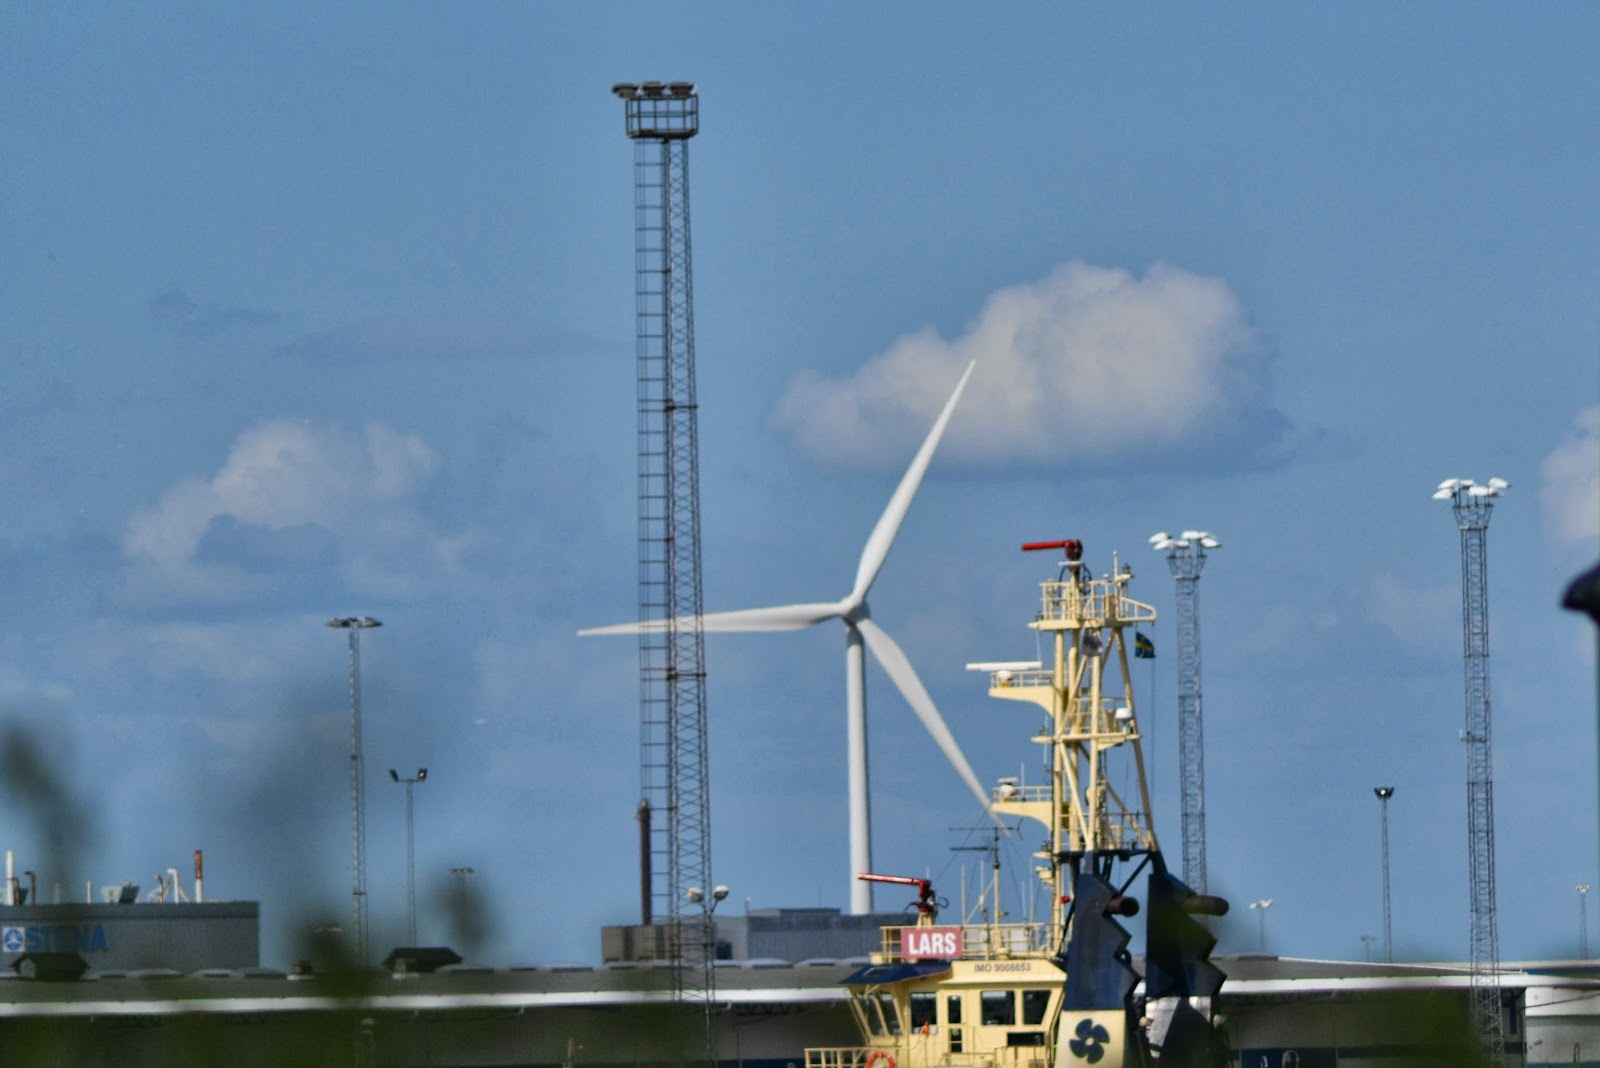 Ubiquitous wind turbine of Sweden